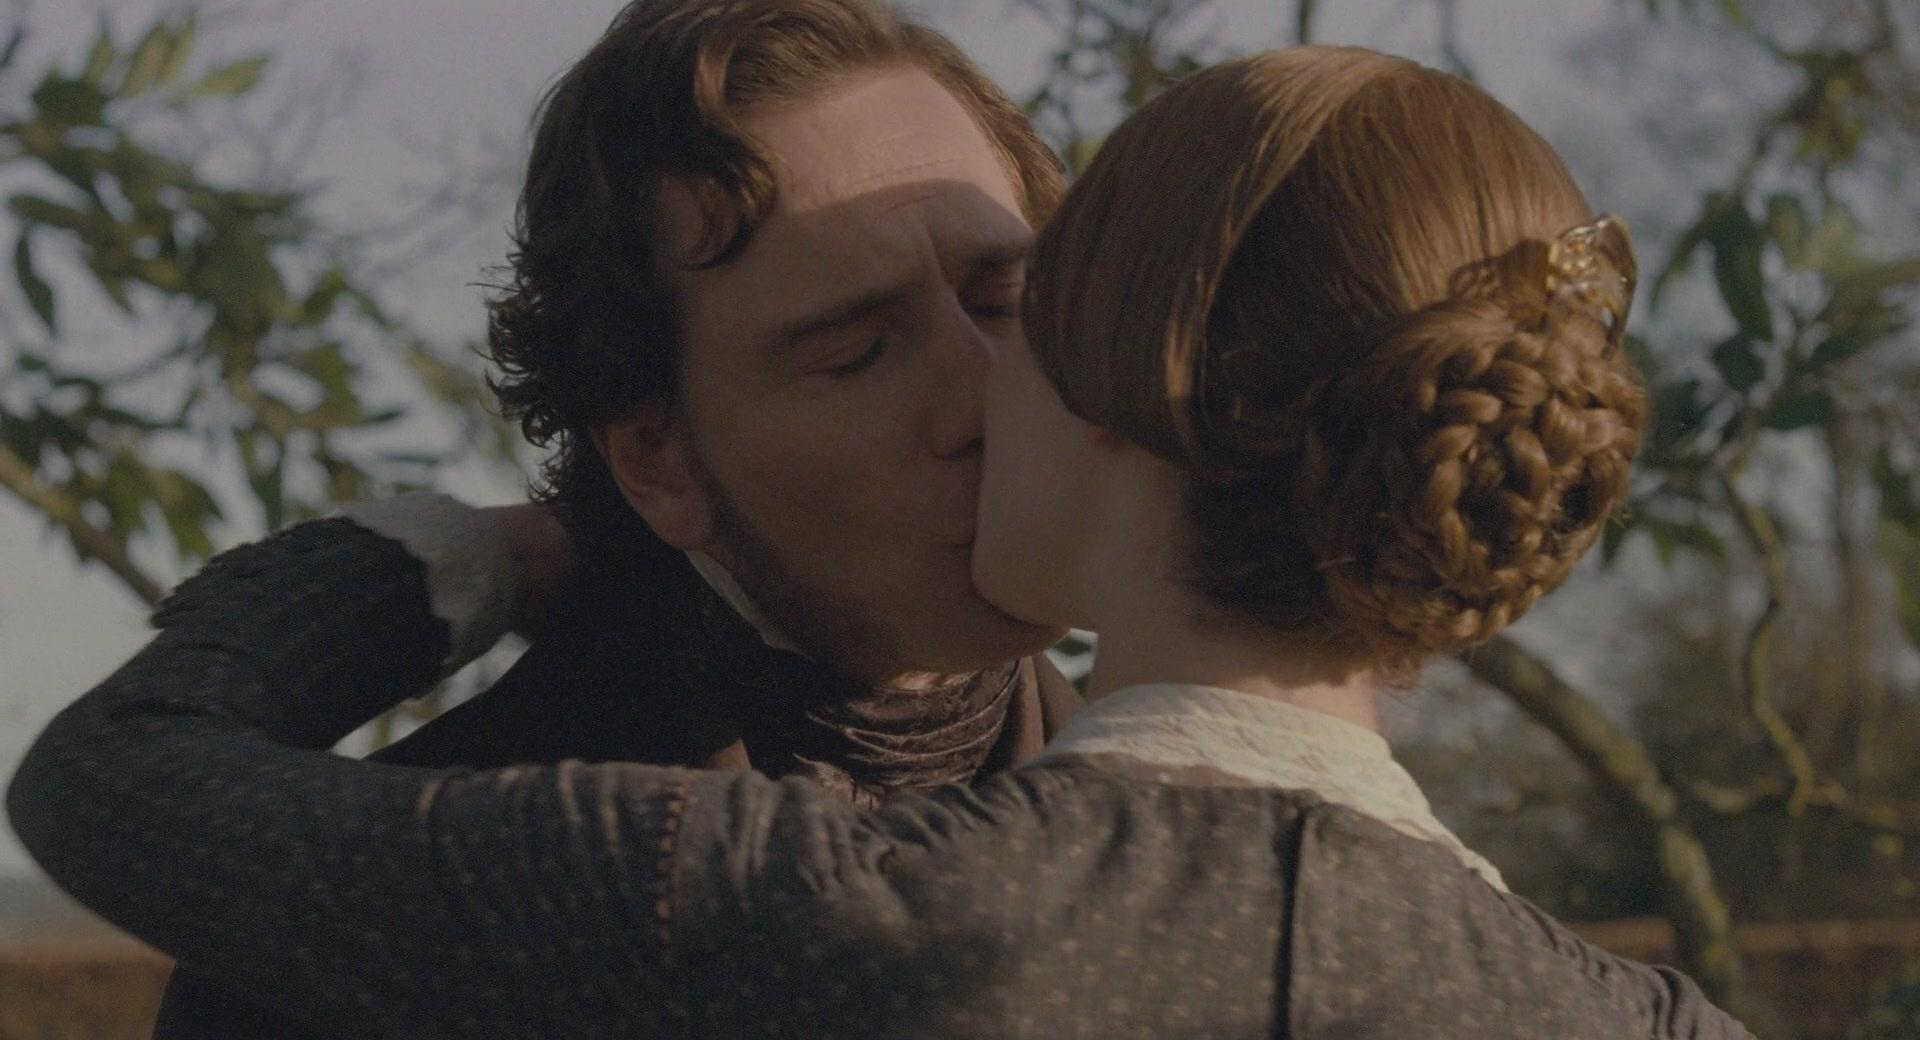 Jane Eyre 2011 Michael Fassbender